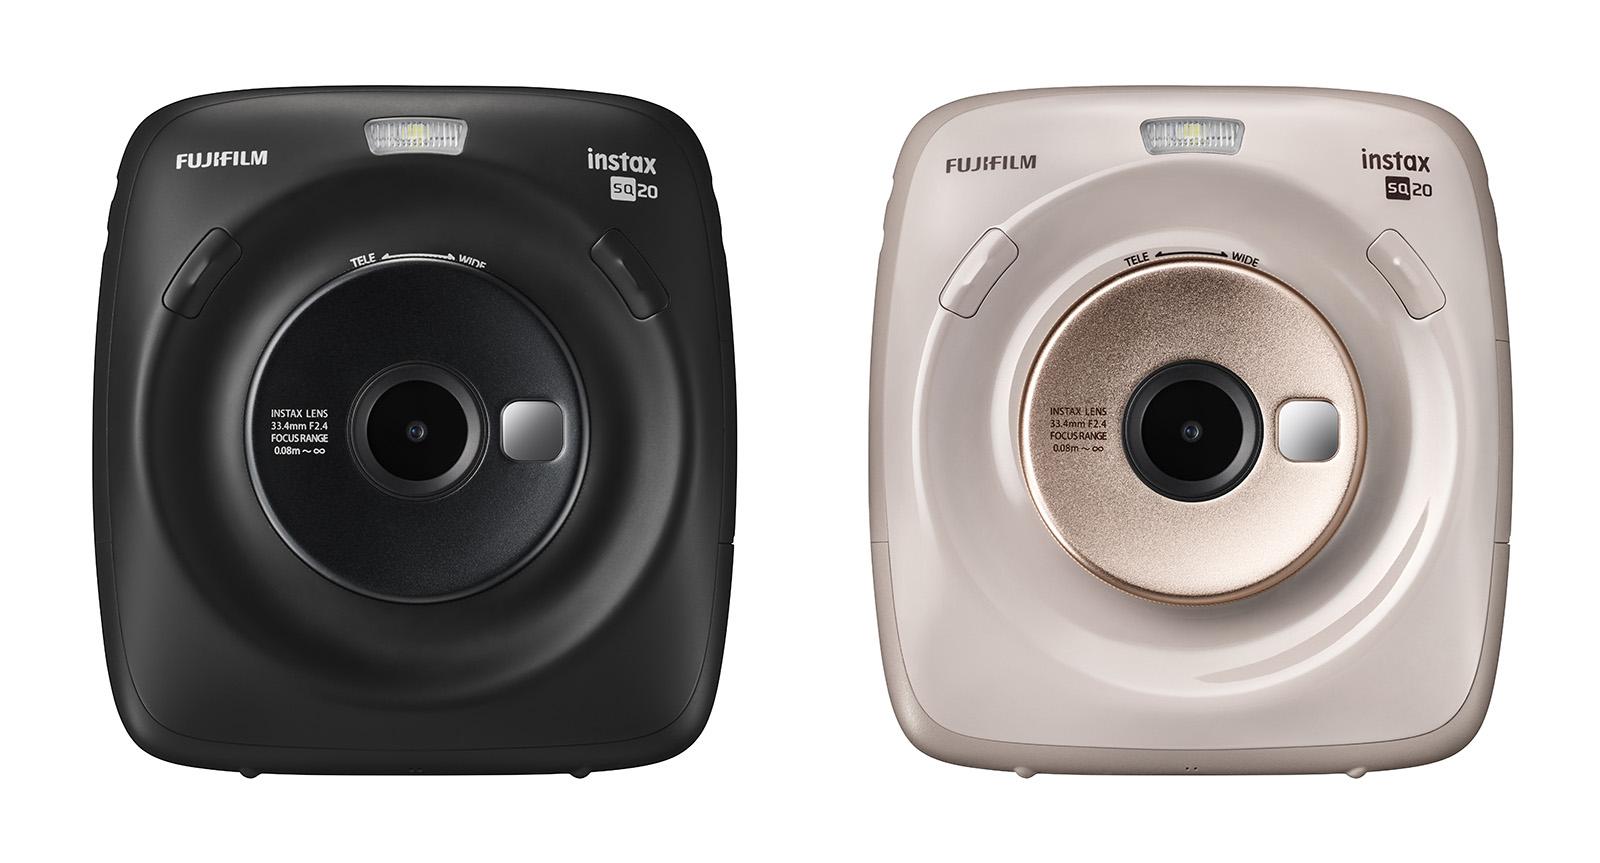 Fujifilm's Instax Square SQ20 uses video to improve instant photos